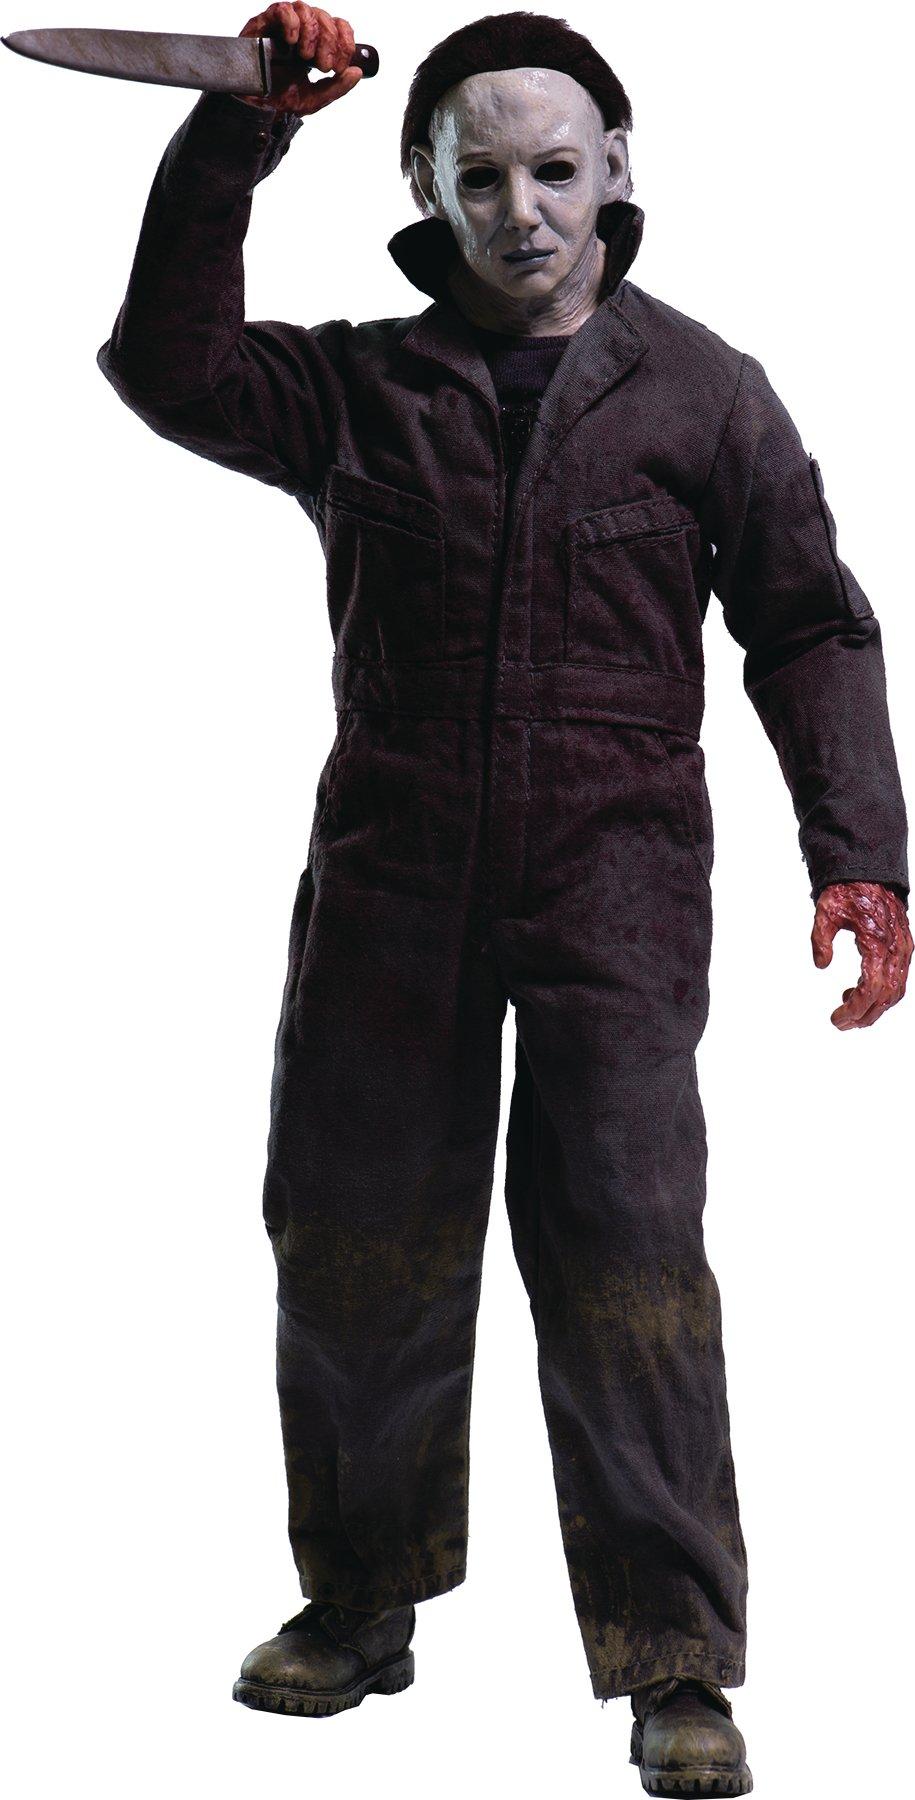 ThreeZero Halloween 6: The Curse of Michael Myers 1:6 Scale Action Figure